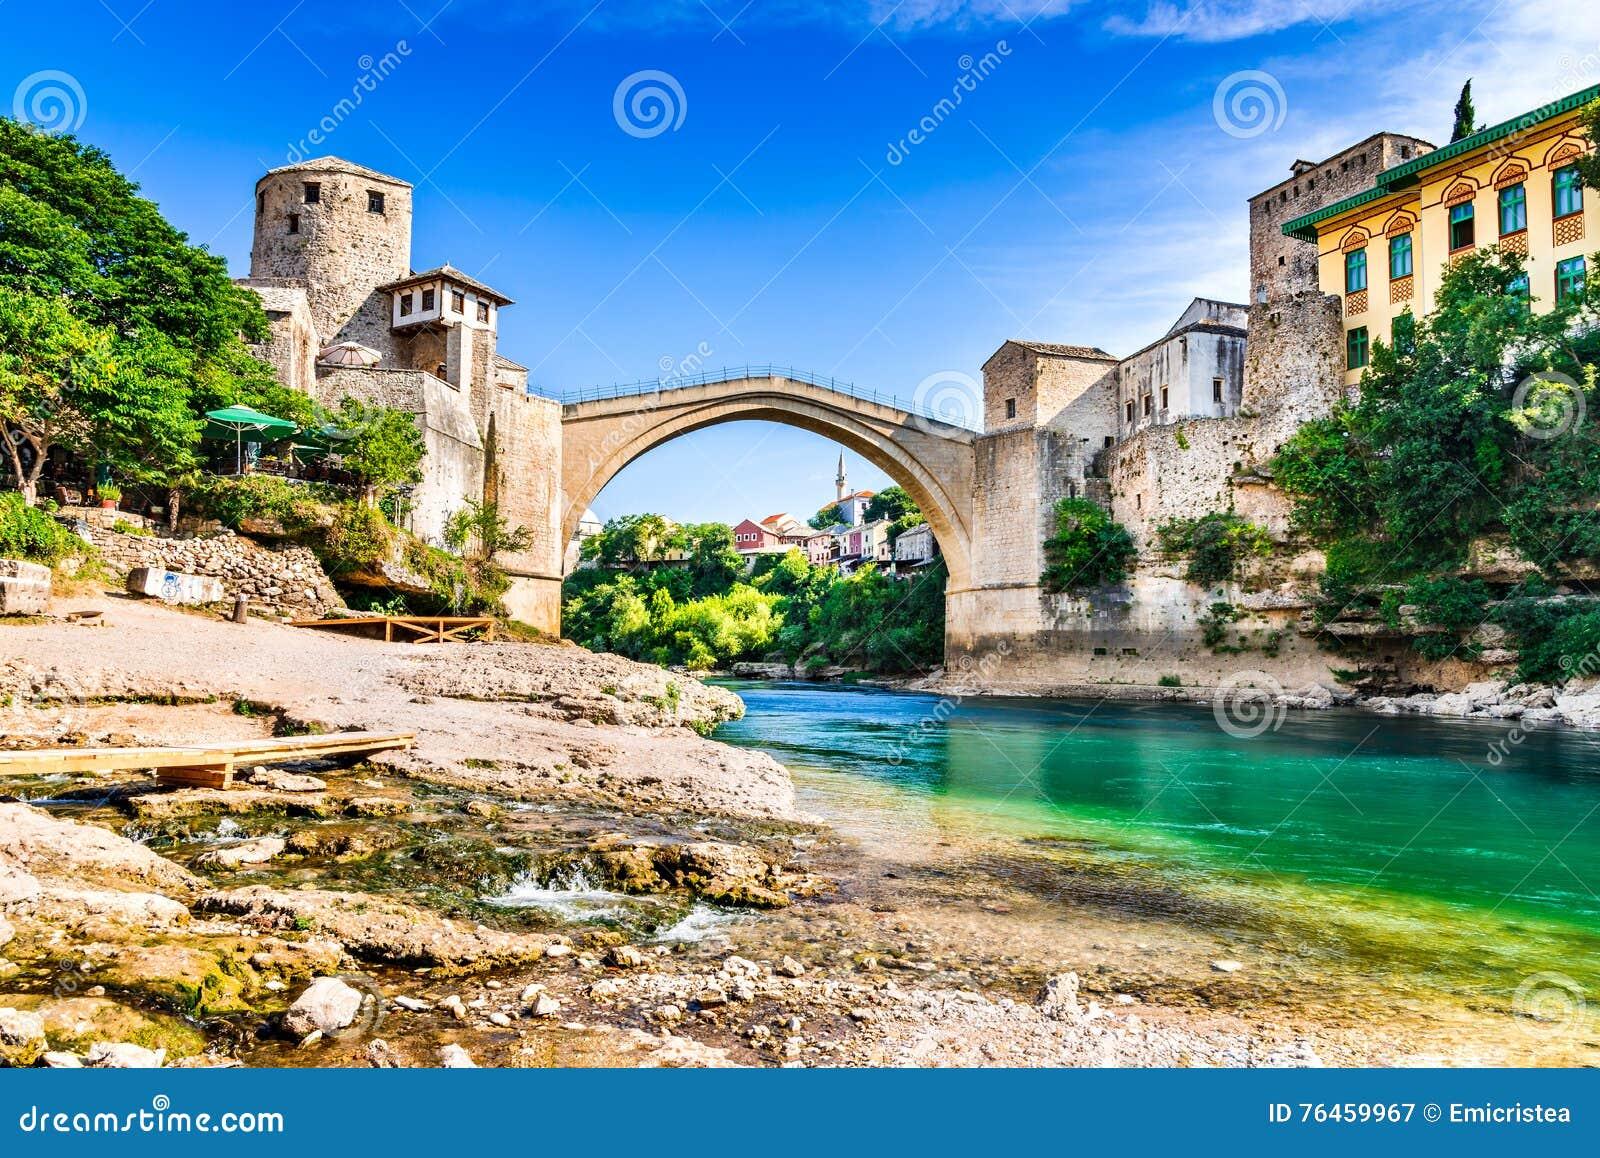 Mostar, Bosnië-Herzegovina - Stari het meest, Oude Brug